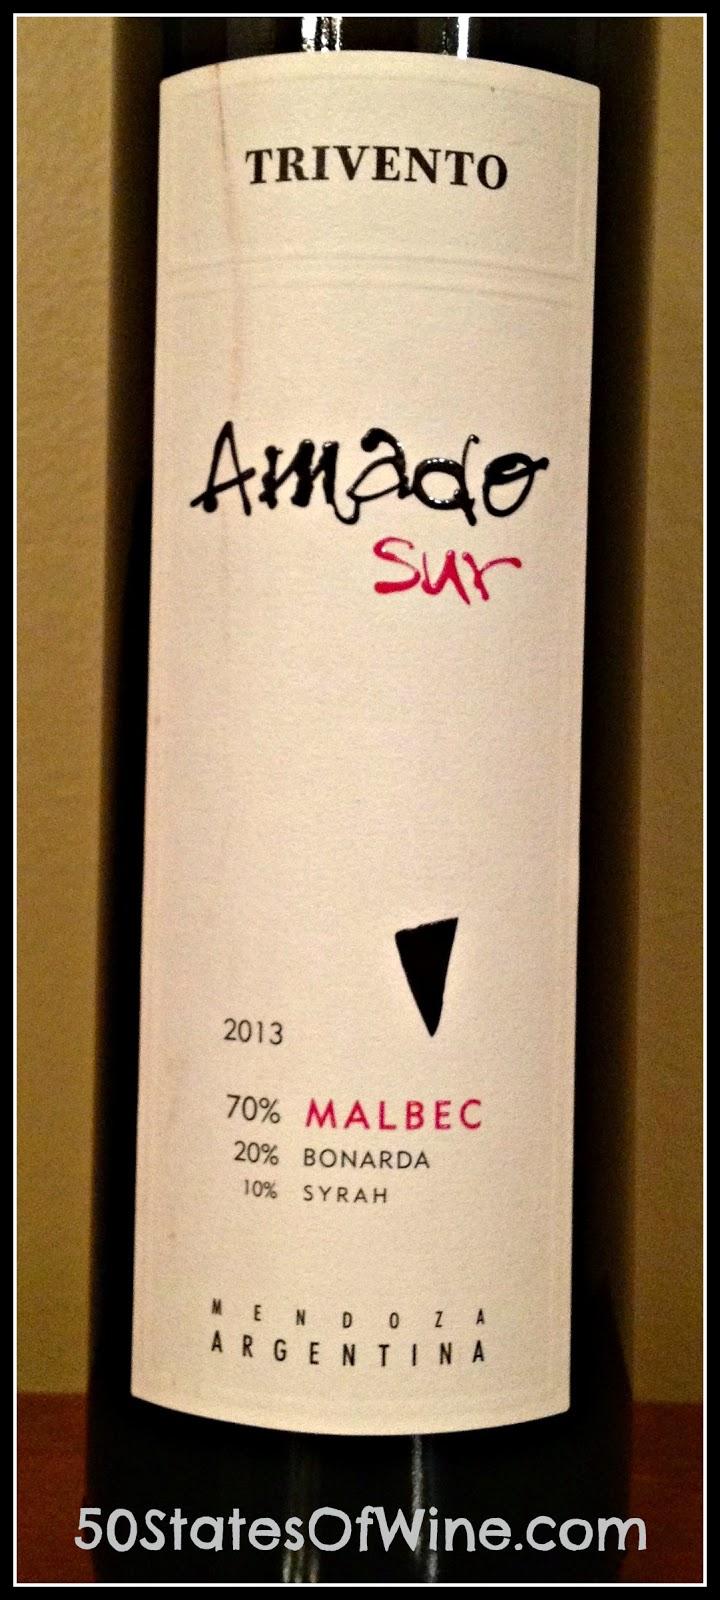 Amado Sur Malbec Blend 2013